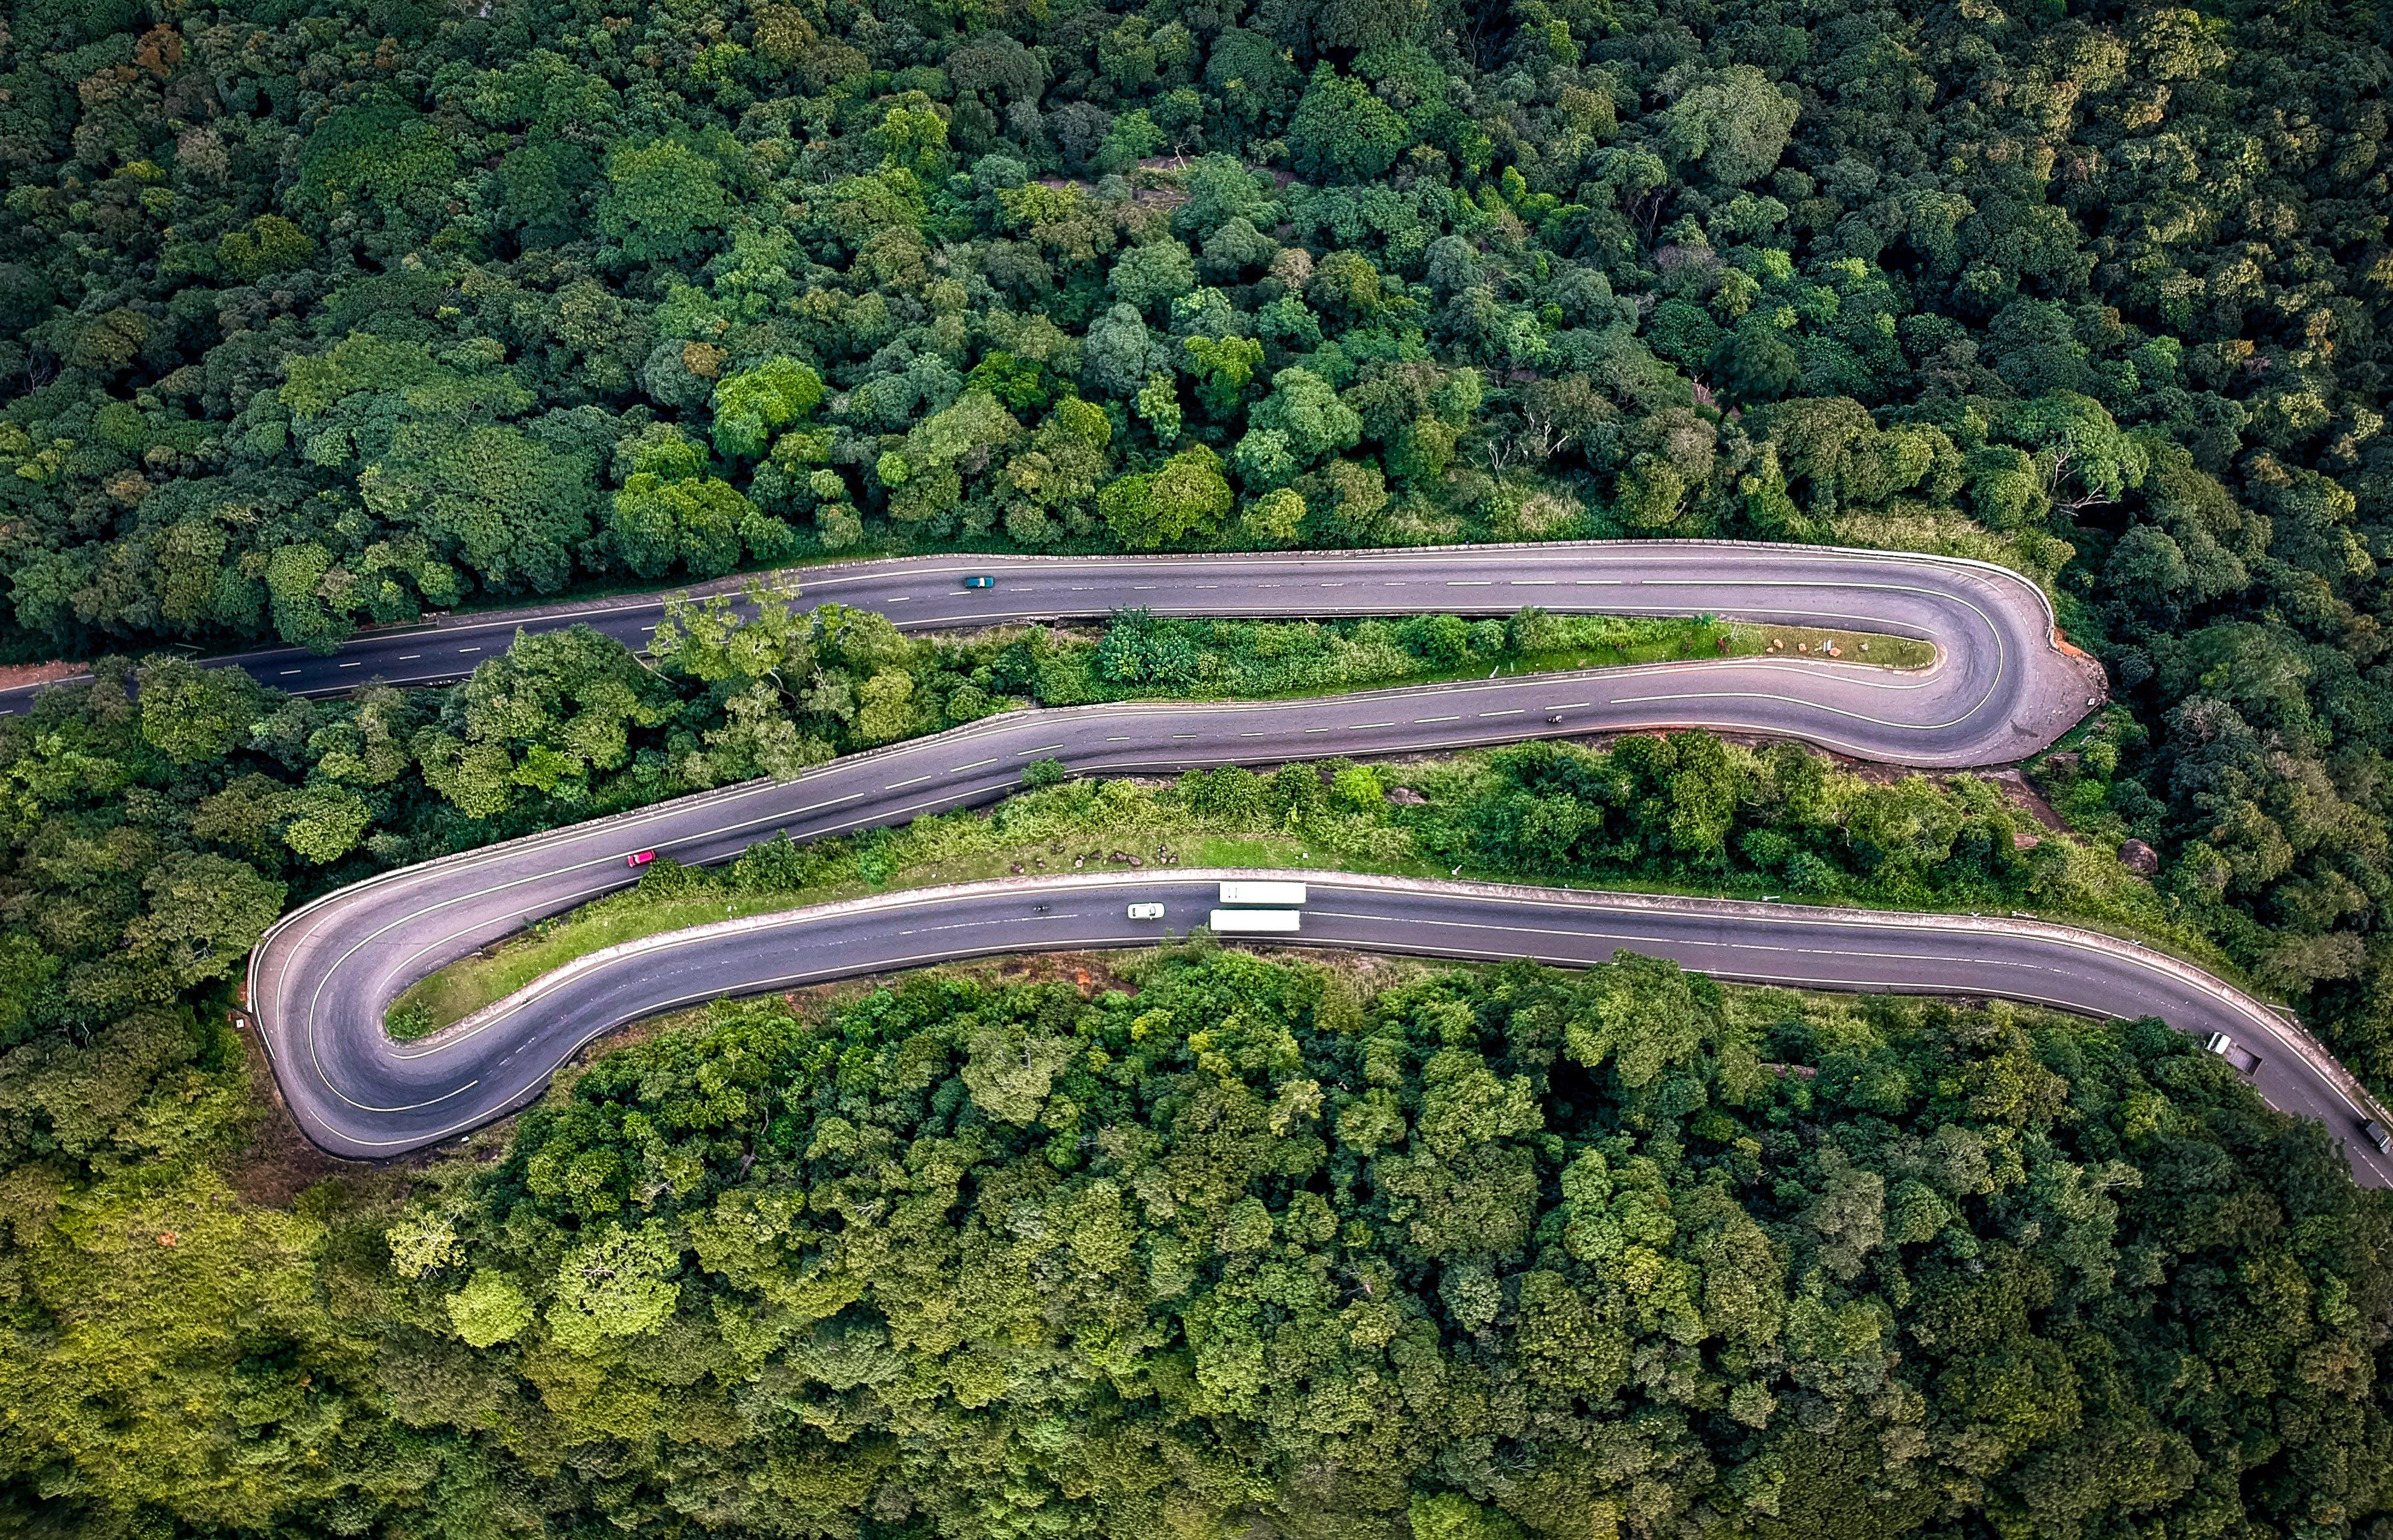 Birds-eye View of Road